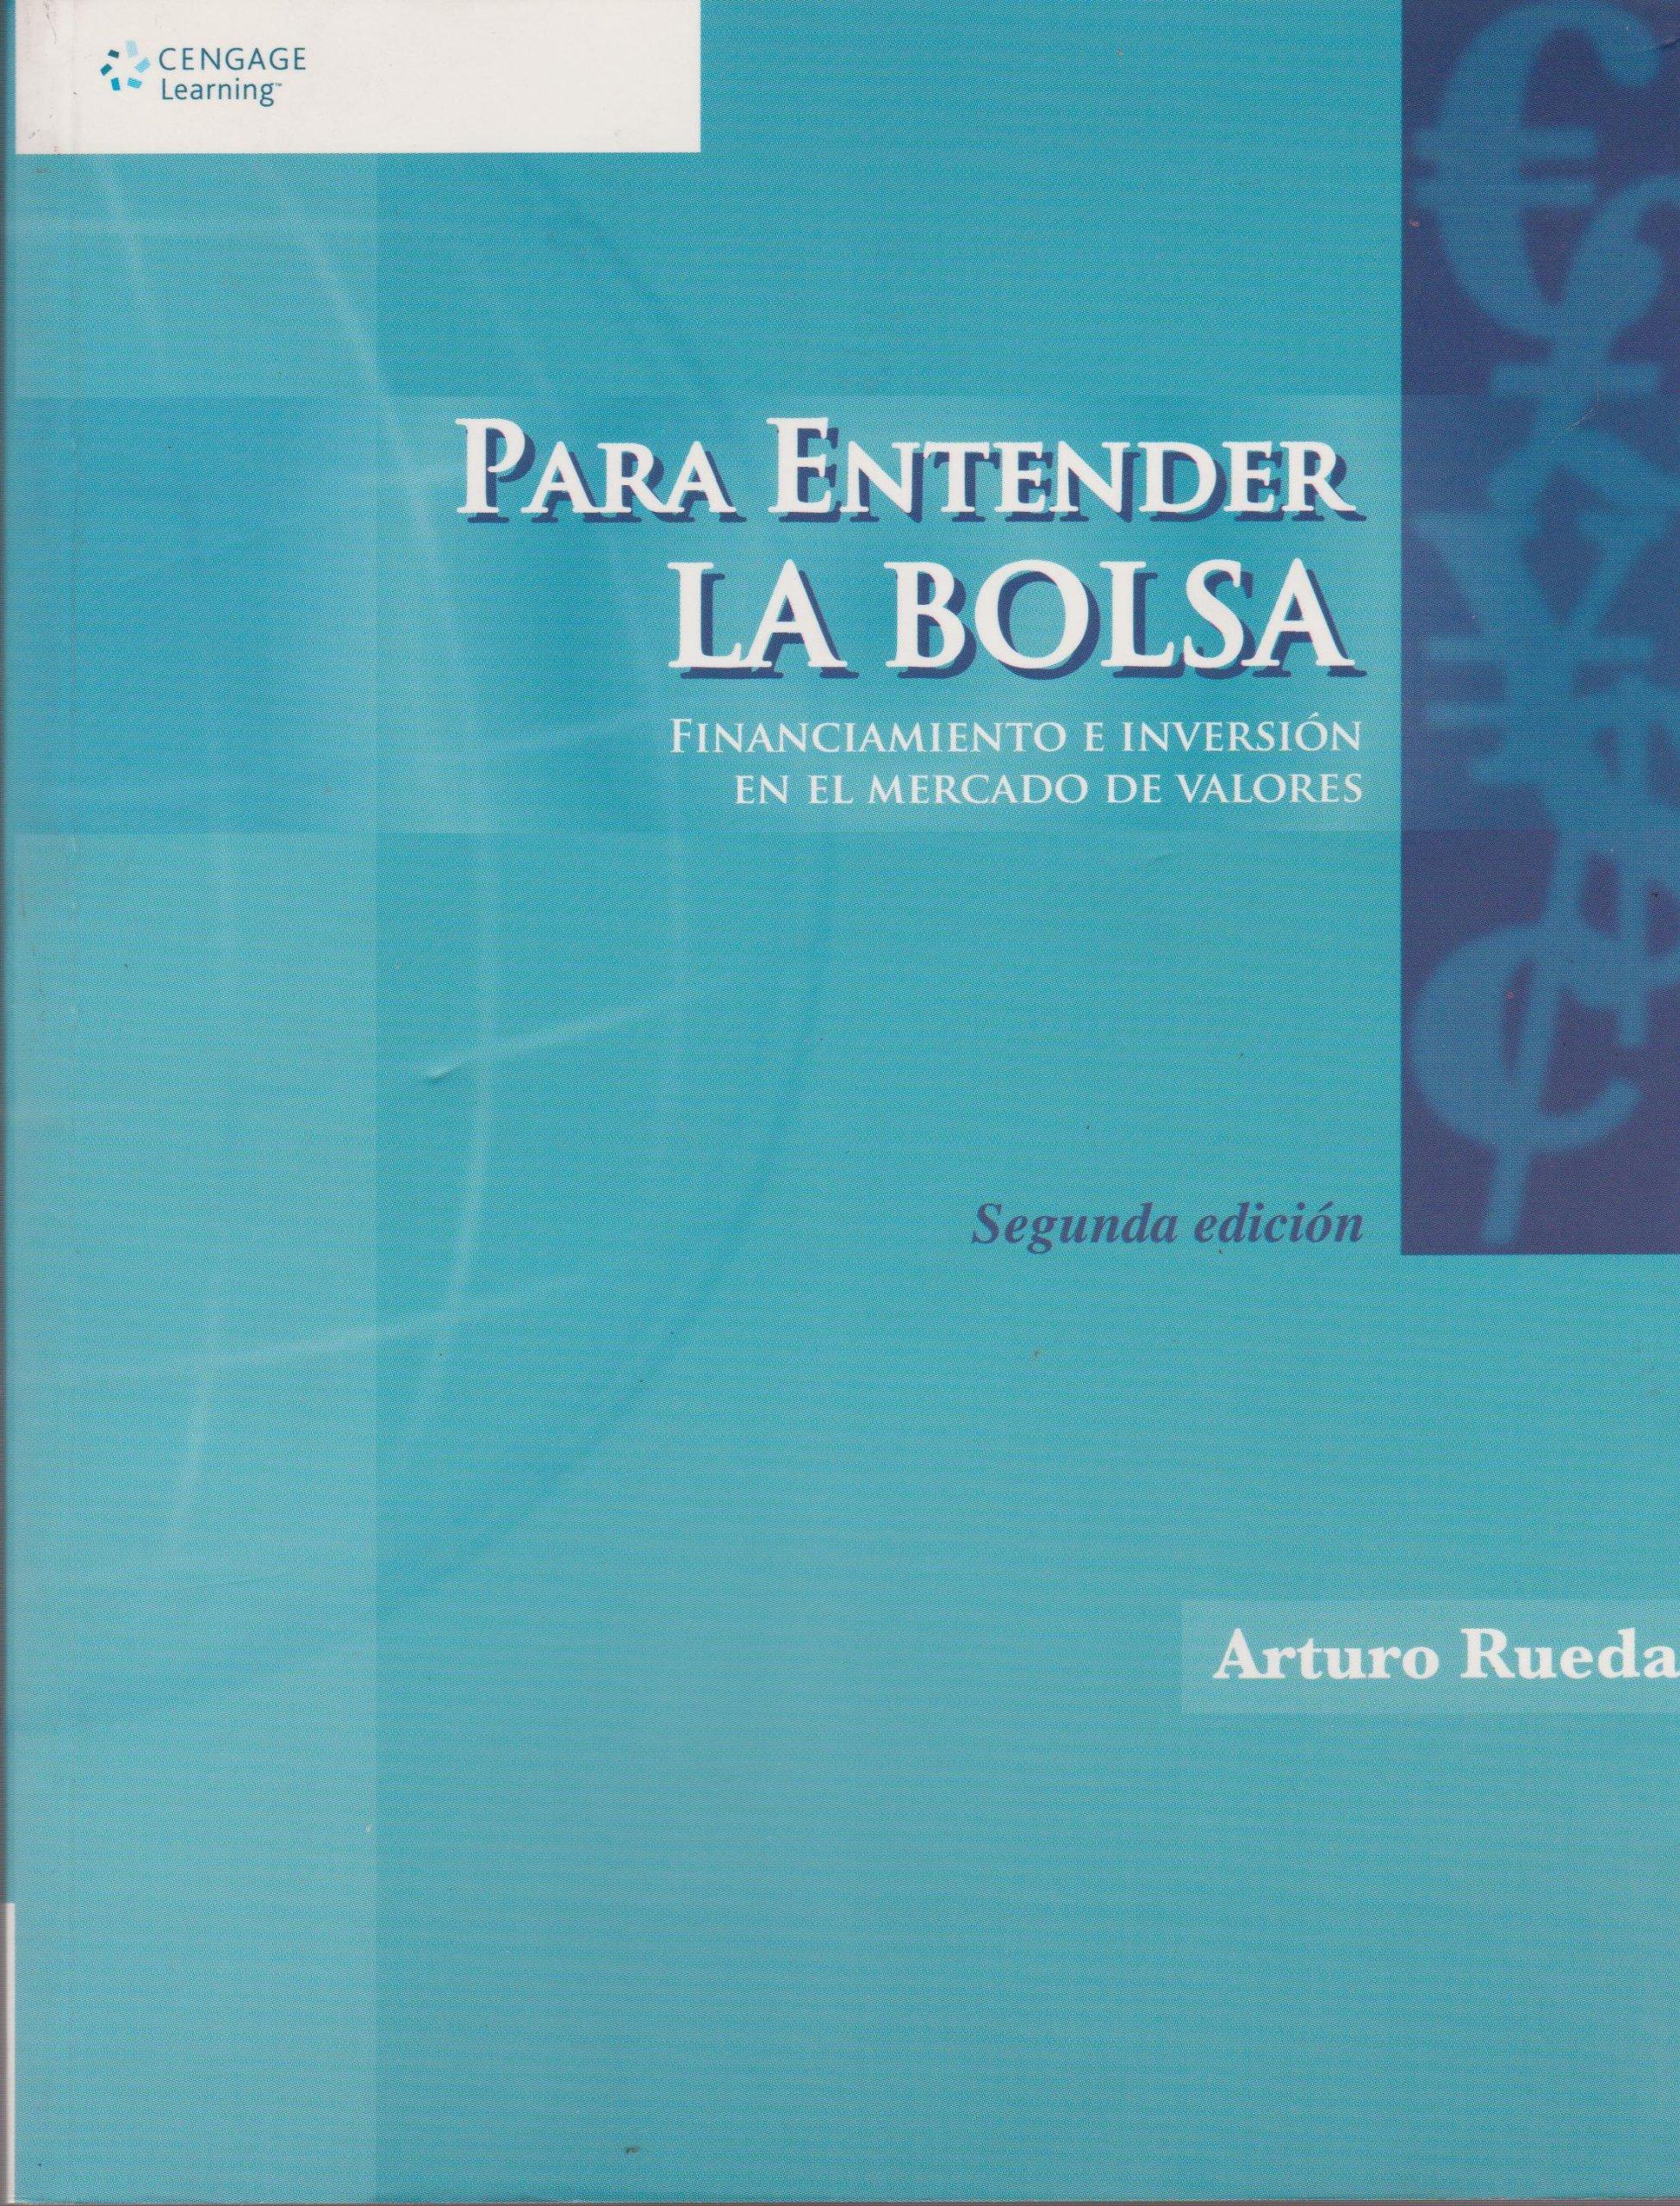 Para entender la bolsa/ Understanding the Stock Exchange (Spanish Edition): Arturo Rueda: 9789706864659: Amazon.com: Books